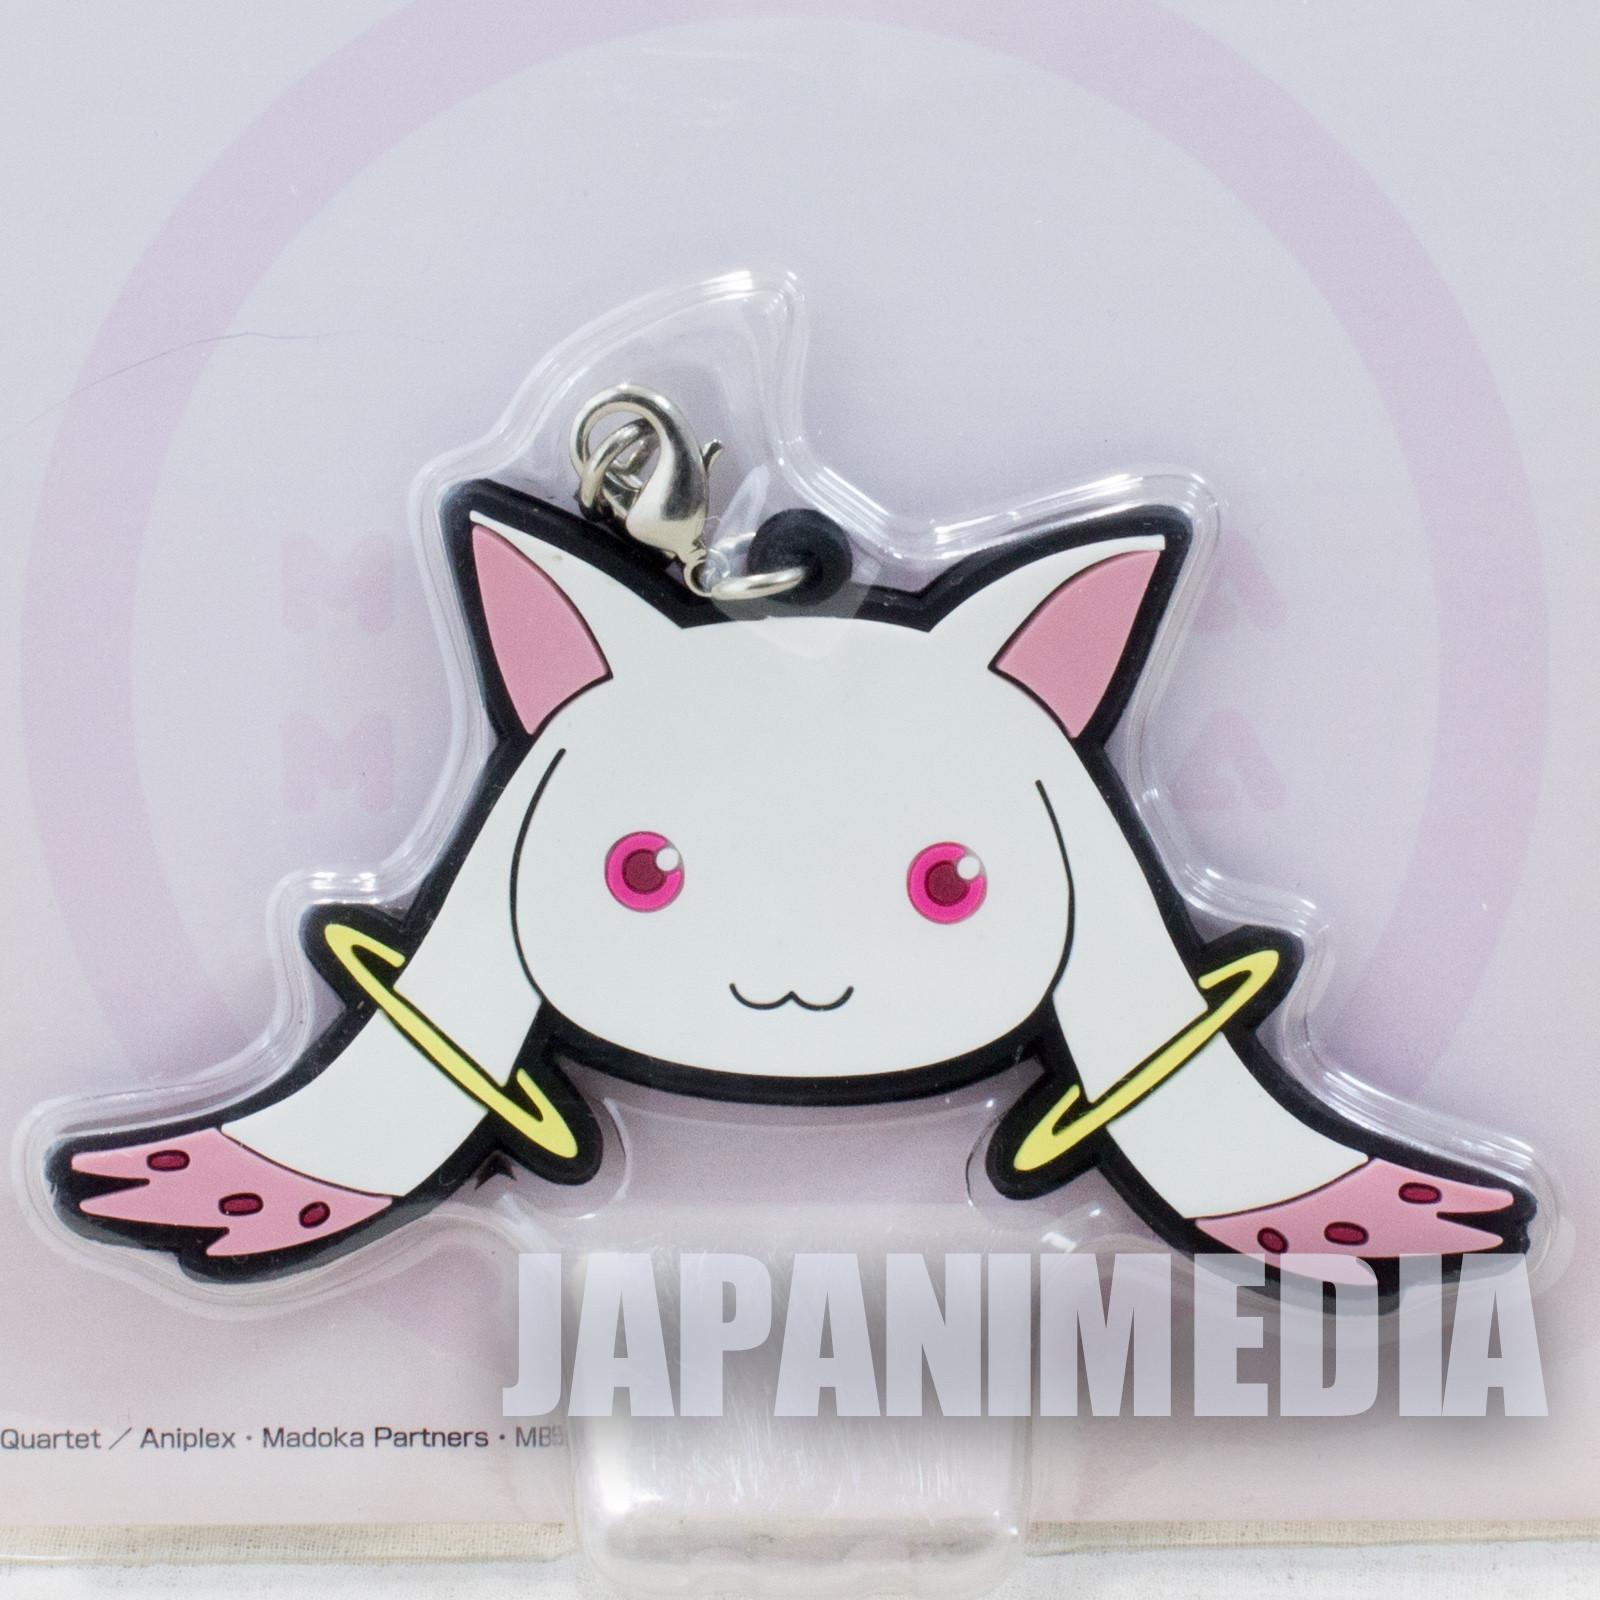 Puella Magi Madoka Magica Kyubey Rubber Strap JAPAN ANIME MANGA CAT 2